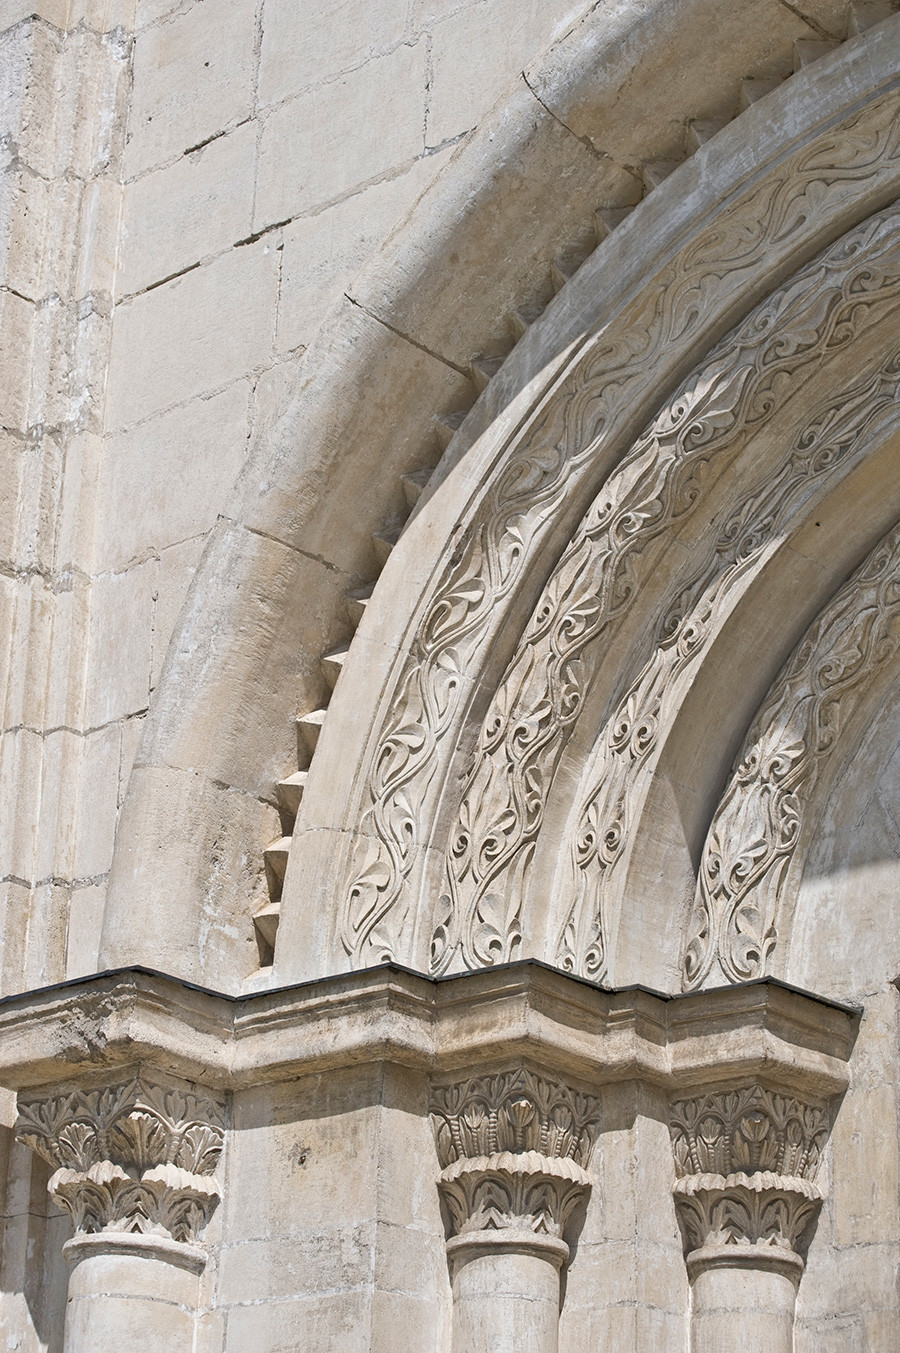 Cathédrale de la Dormition, portail principal, arcades en pierres sculptées